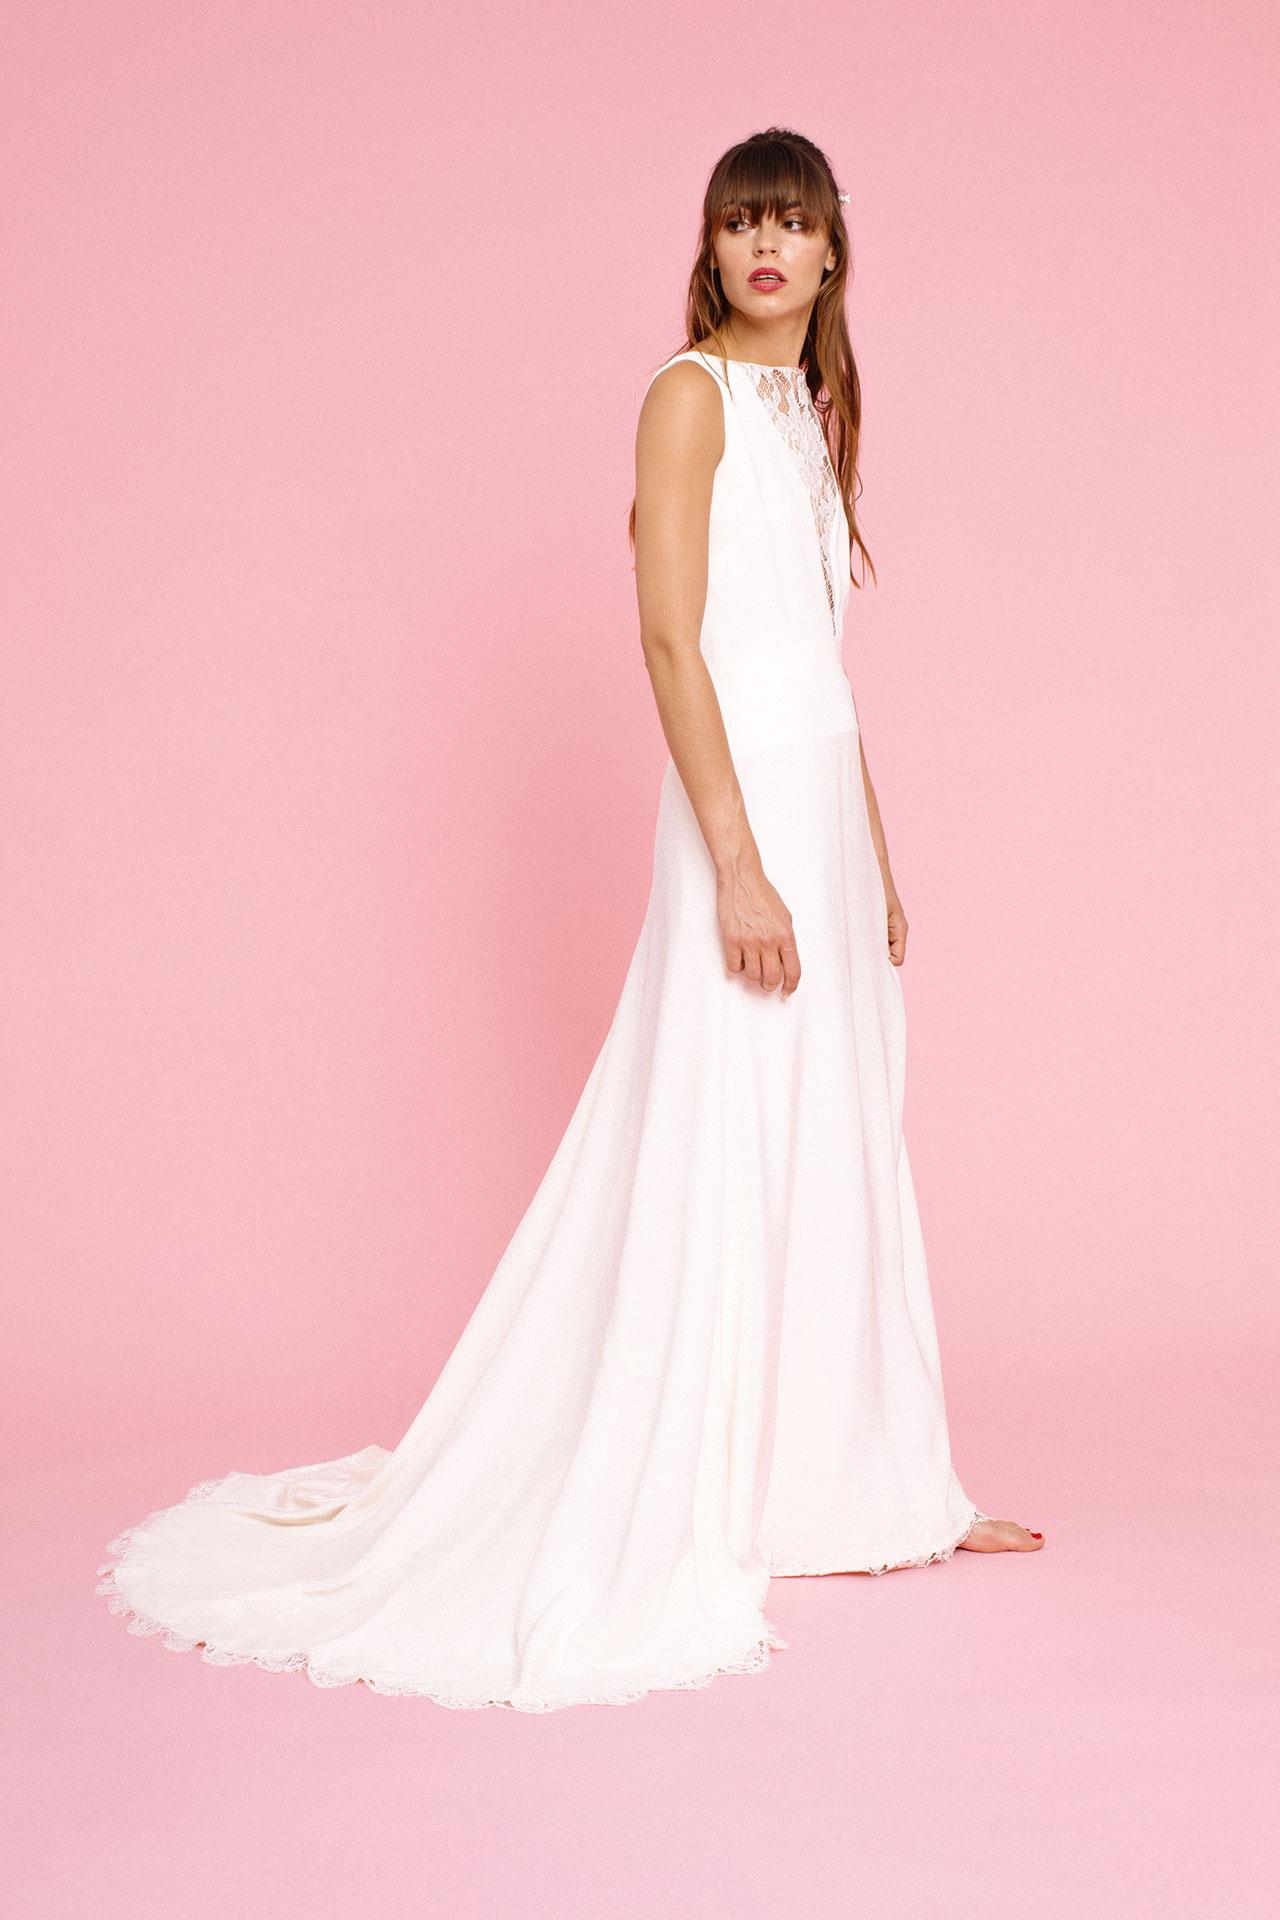 elise-hameau-robes-de-mariee-mariage-wedding-dresses-couture-bridal-brides-maud-chalard-Rose_003.JPG